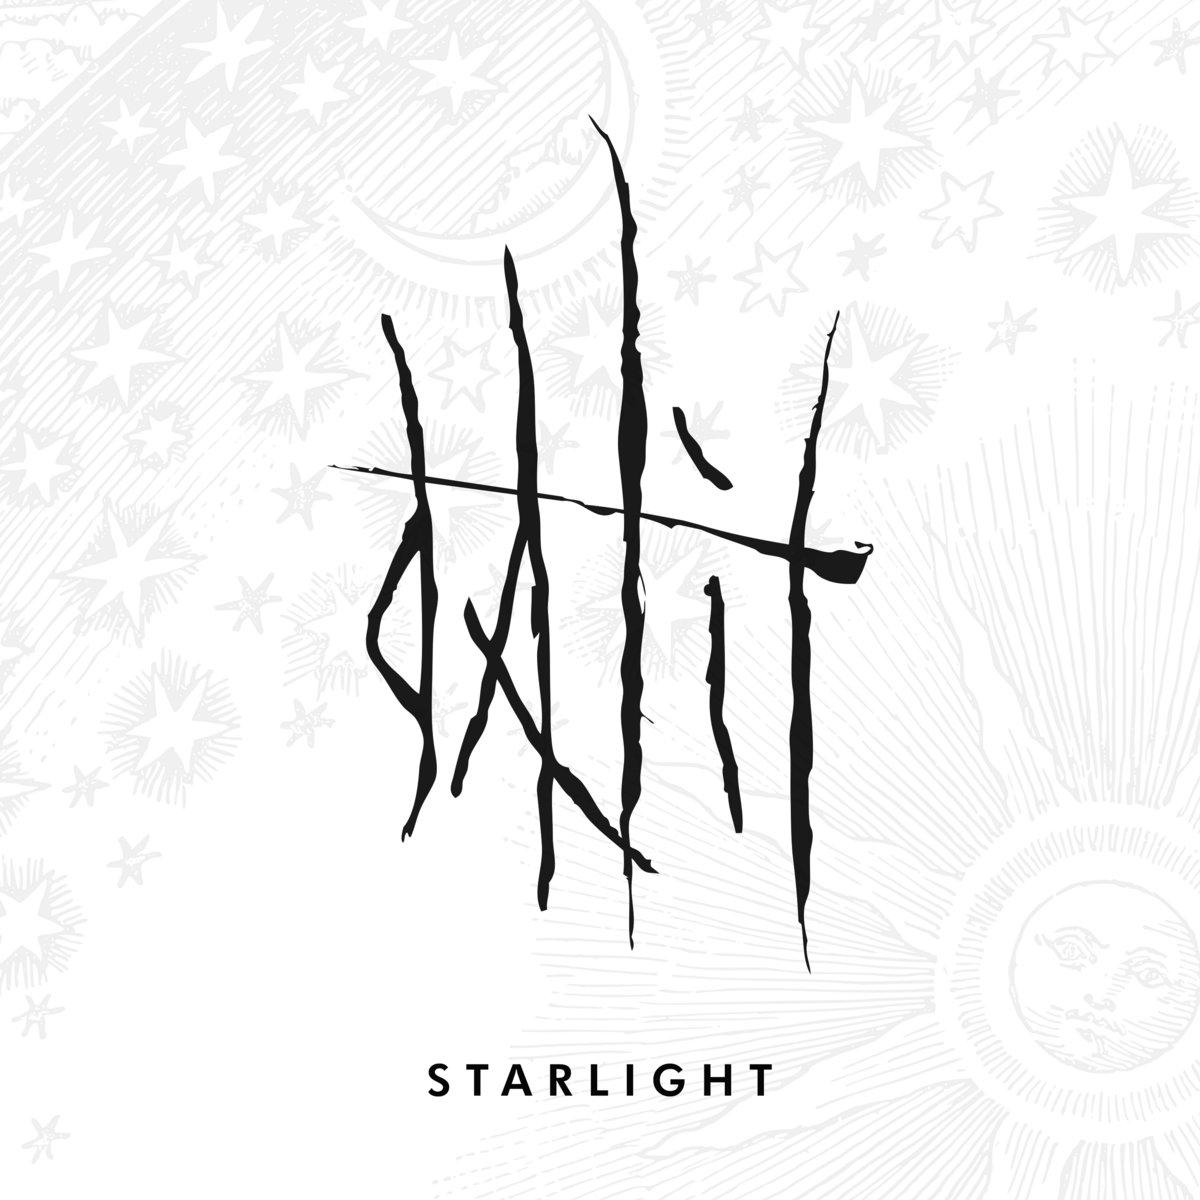 Starlight | DALIT